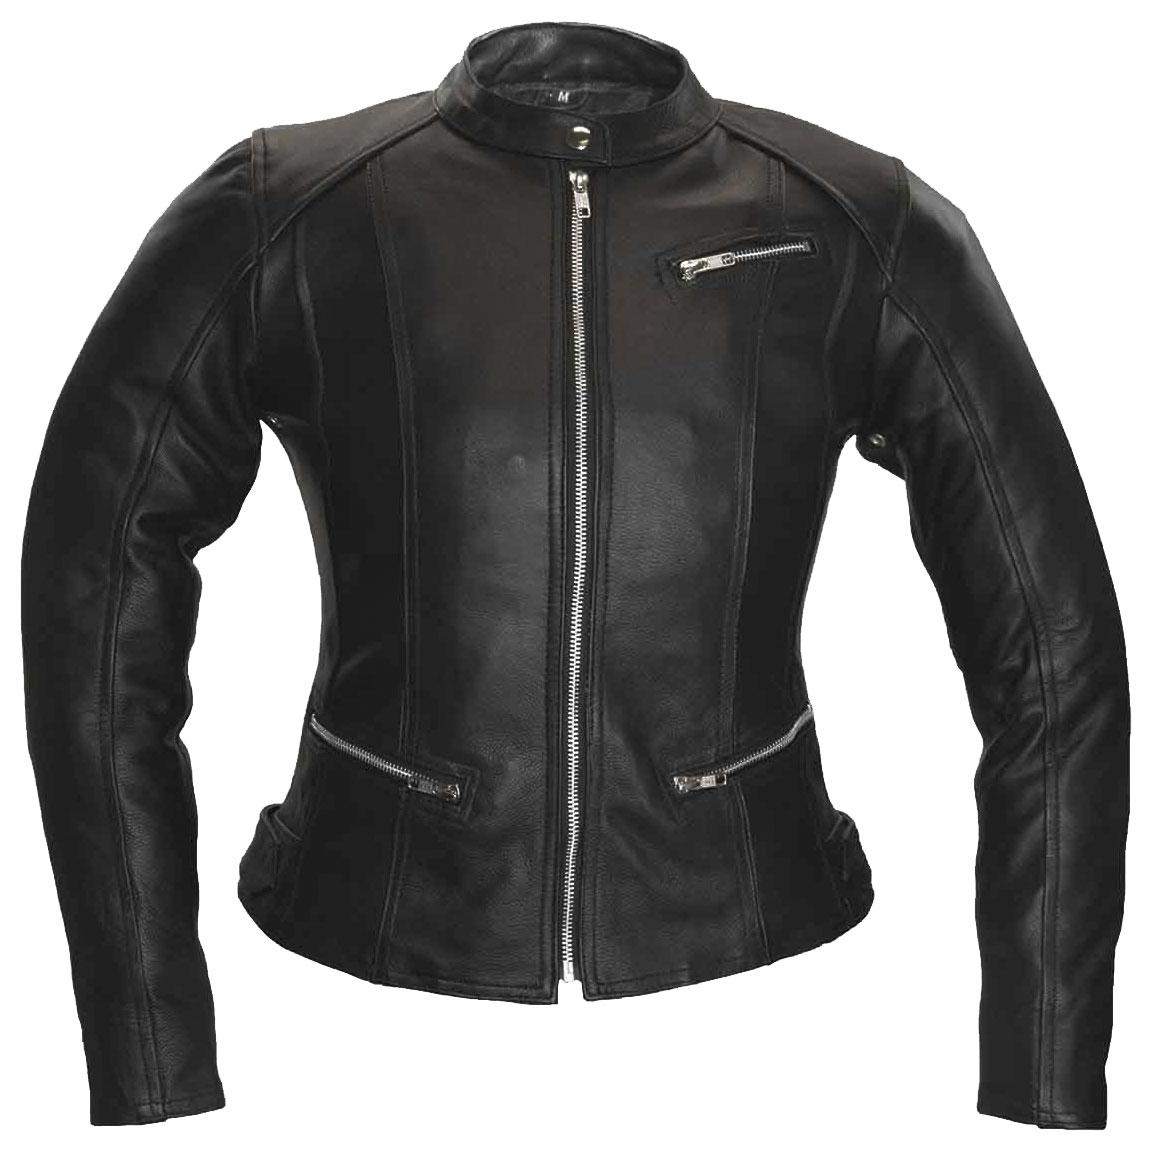 Vance Leathers Women's 3 Pocket Black Leather Jacket